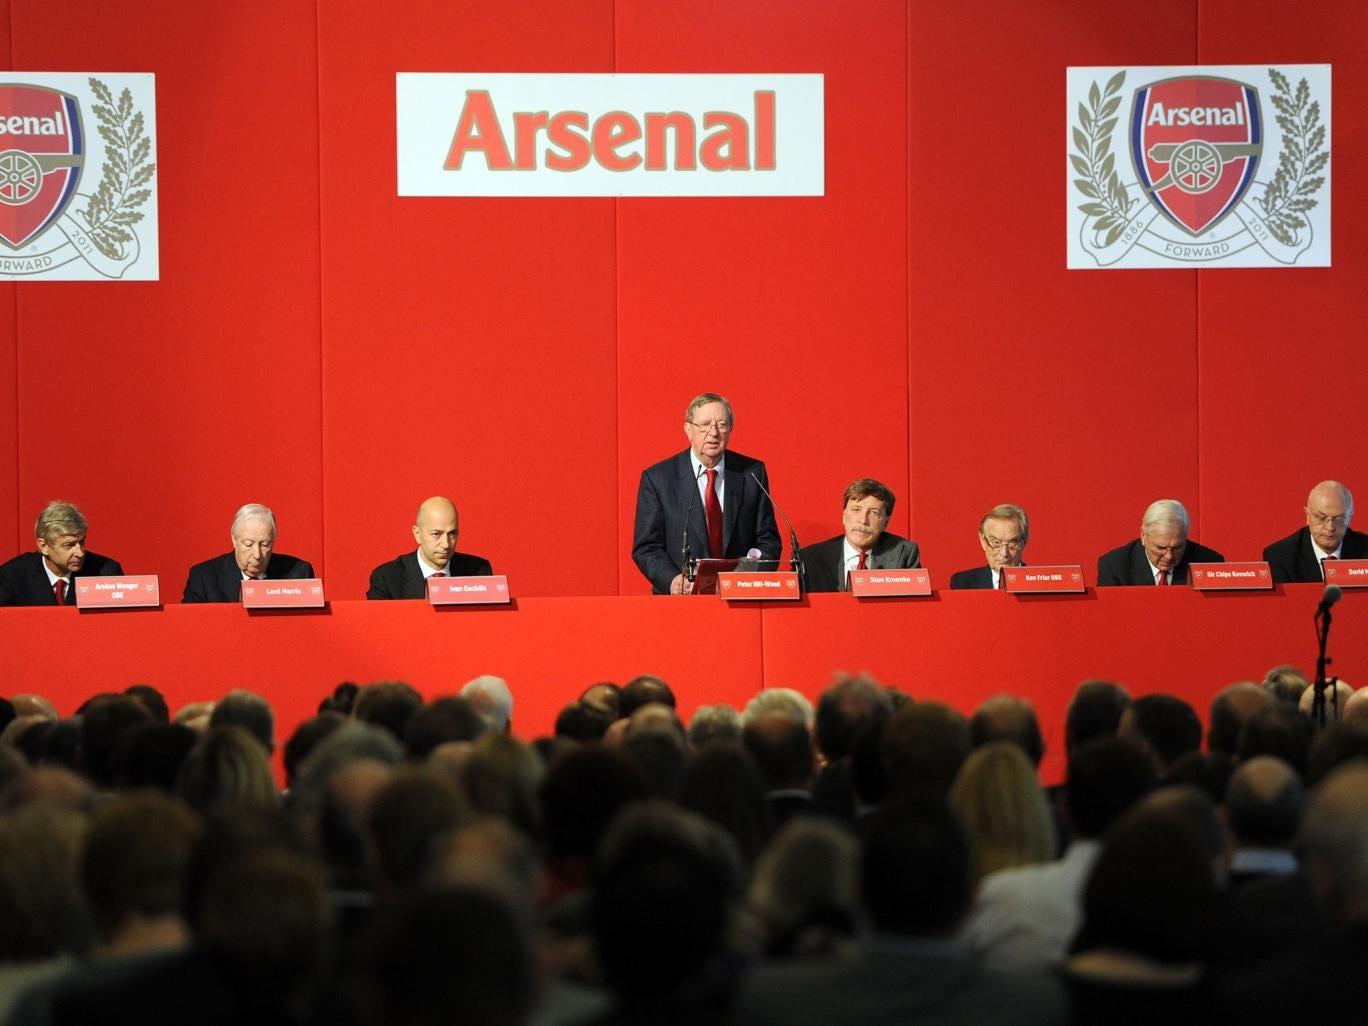 (L-R) Arsene Wenger (Manager), Lord Harris (Director), Ivan Gazidis (CEO), Peter Hill-Wood (Chairman), Stan Kroenke (Director), Ken Friar (Director), Sir Chips Keswick (Director) and David Mile (Club Secretary) during the Arsenal AGM at Emirates Stadium i